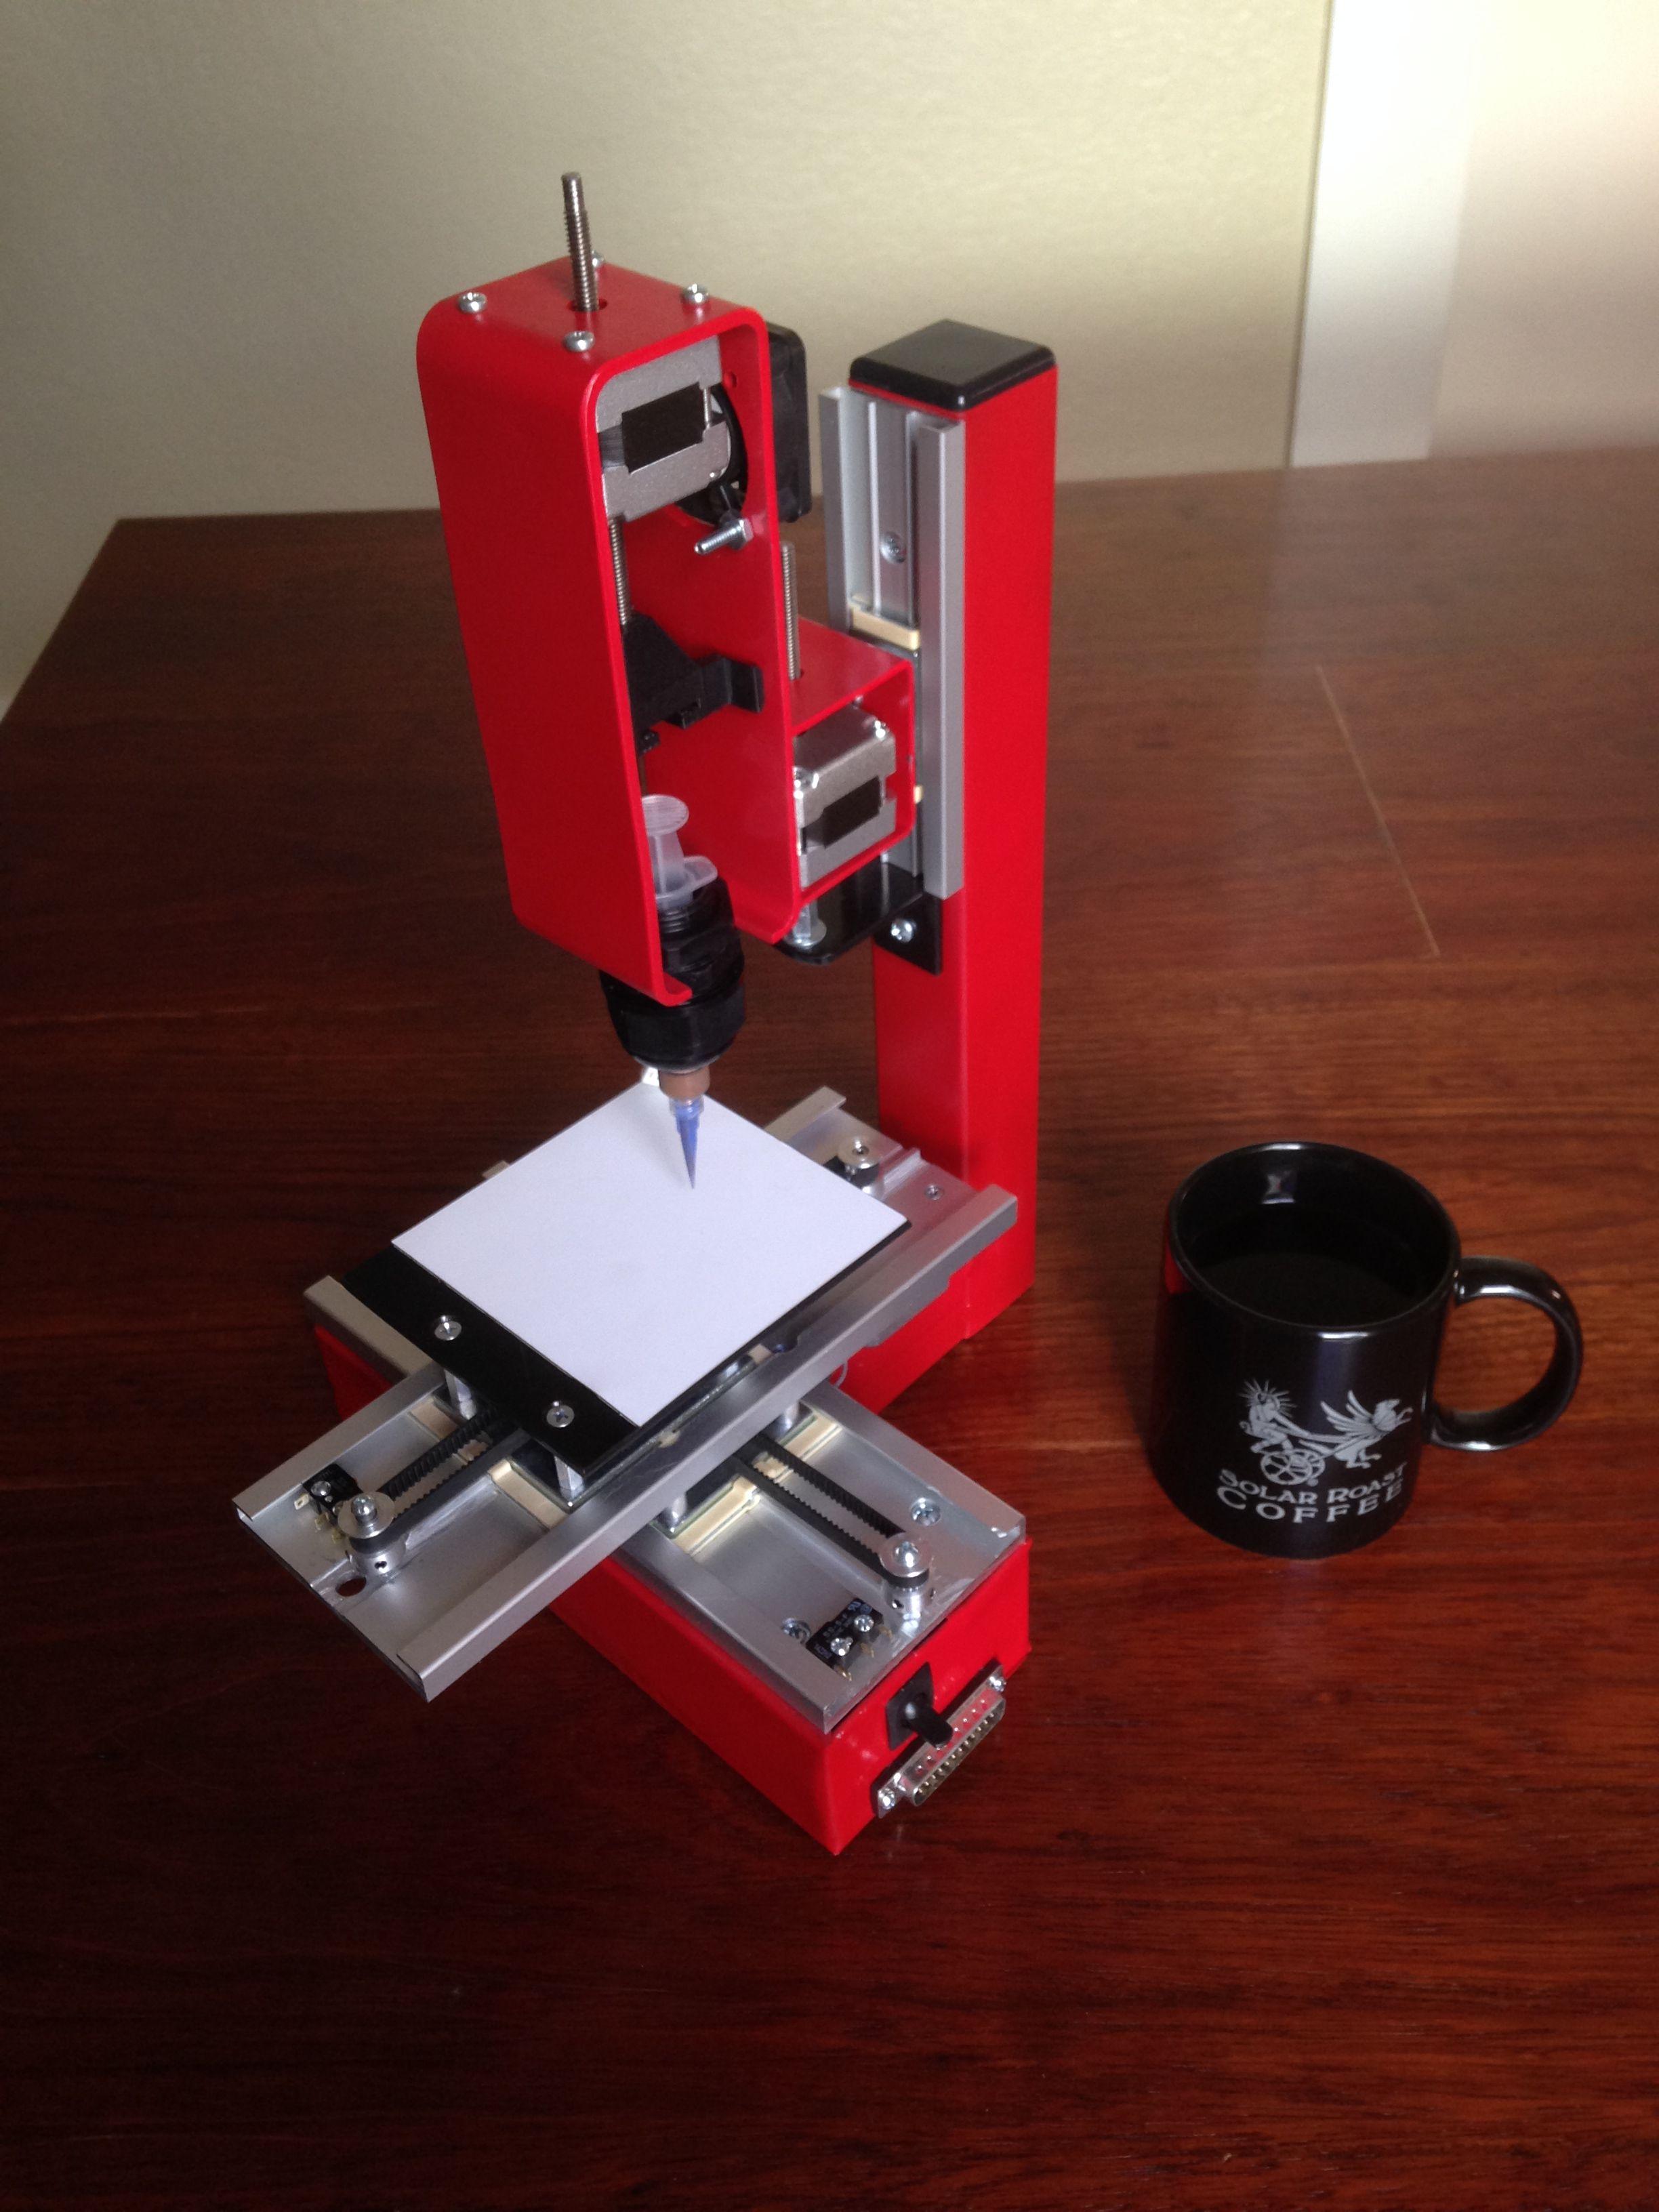 Pin on CNC and 3D Printer